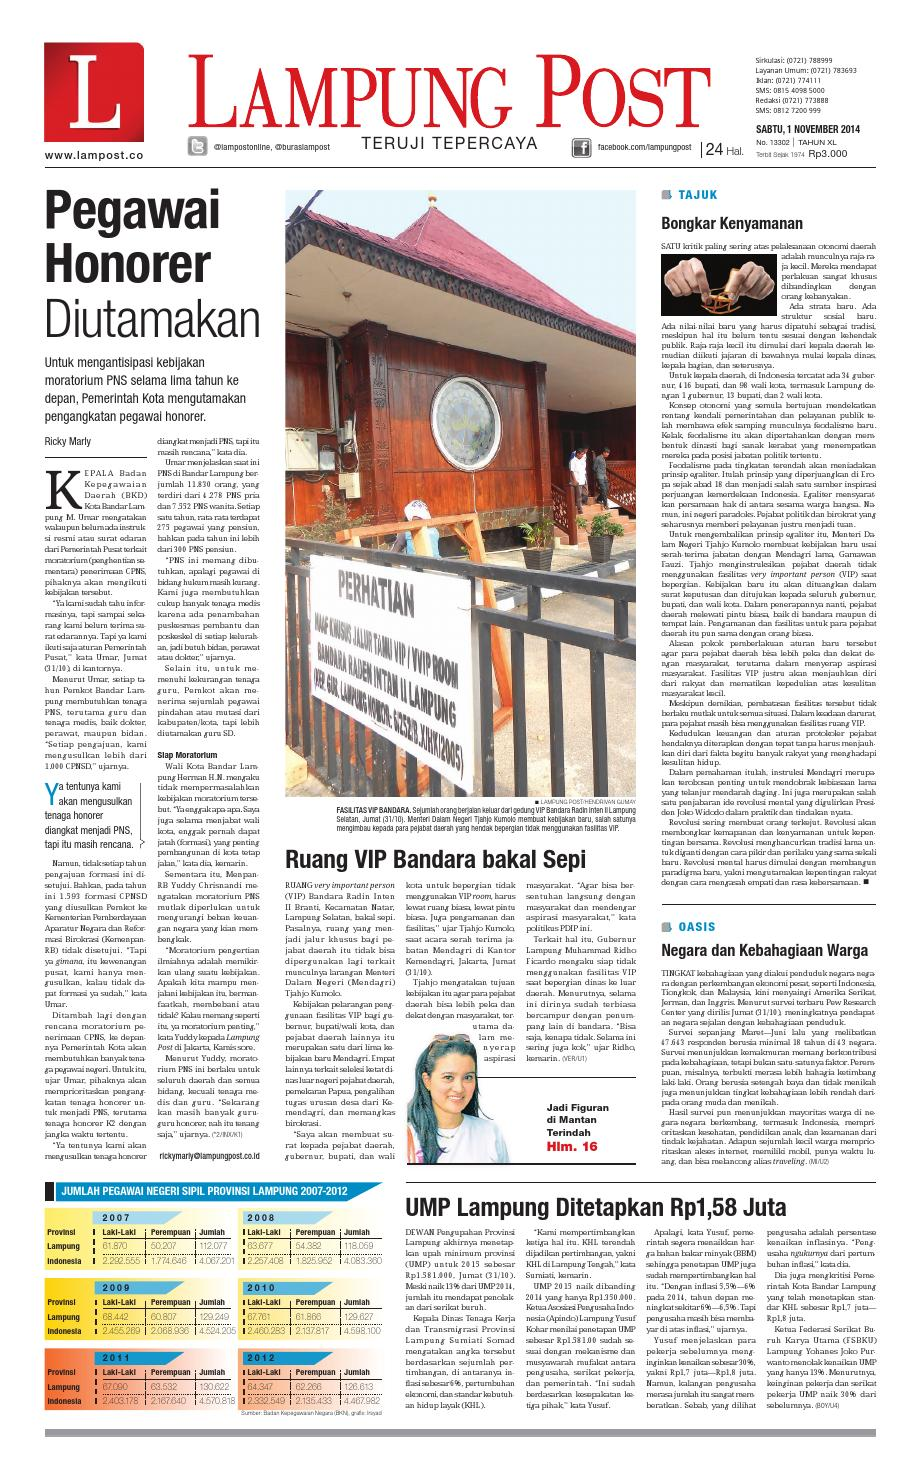 Lampung Post Sabtu 1 November 2014 By Issuu Produk Ukm Bumn Sulam Usus Pmk